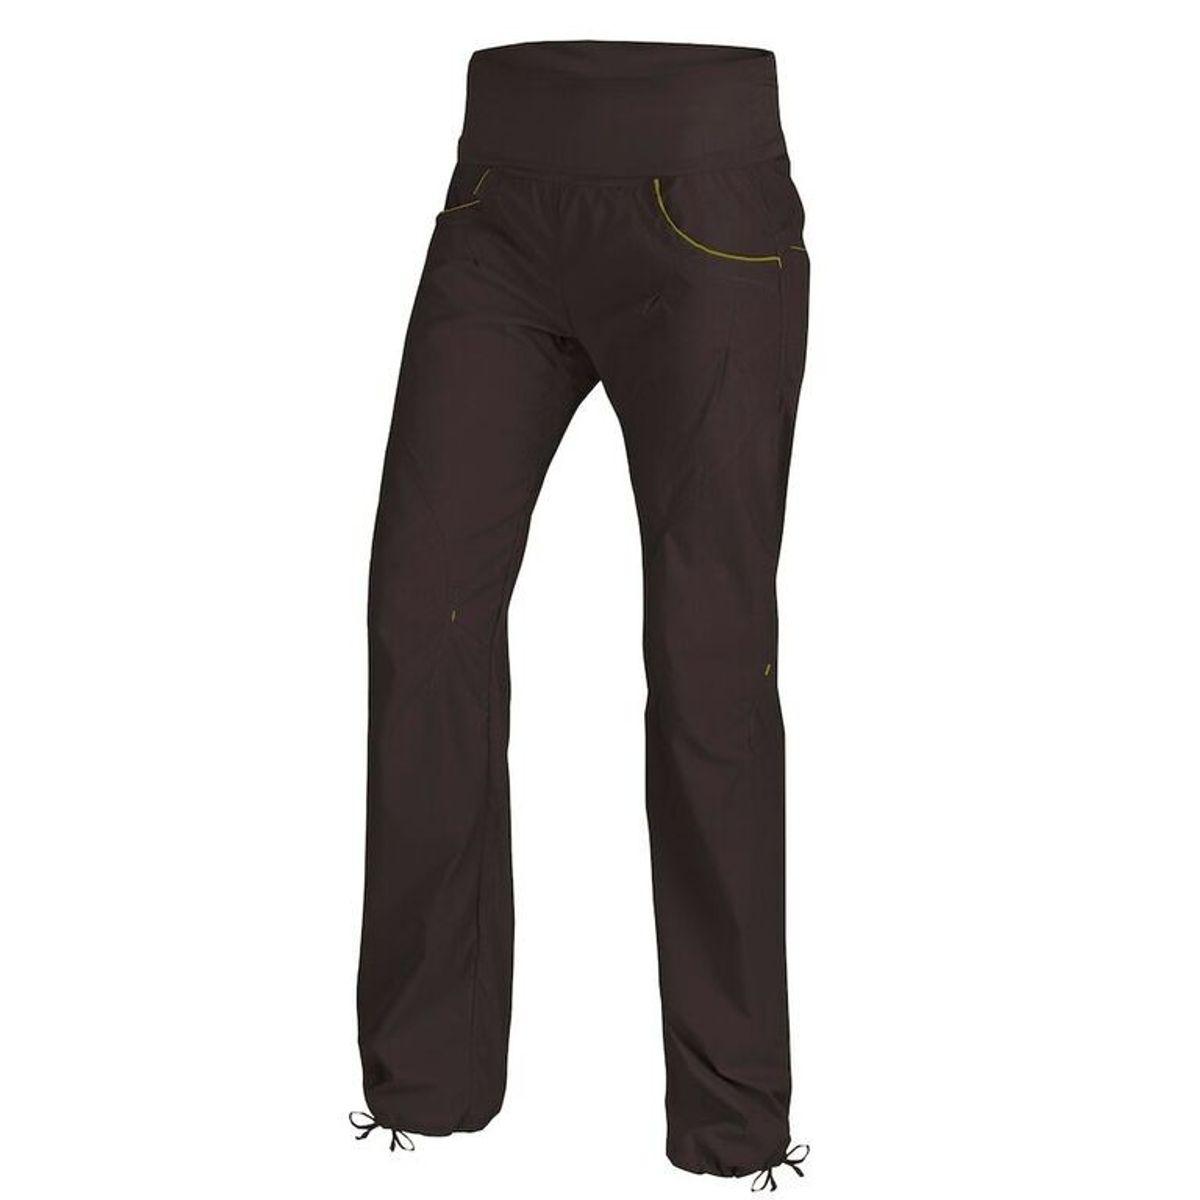 Ocun - Noya Pants Women